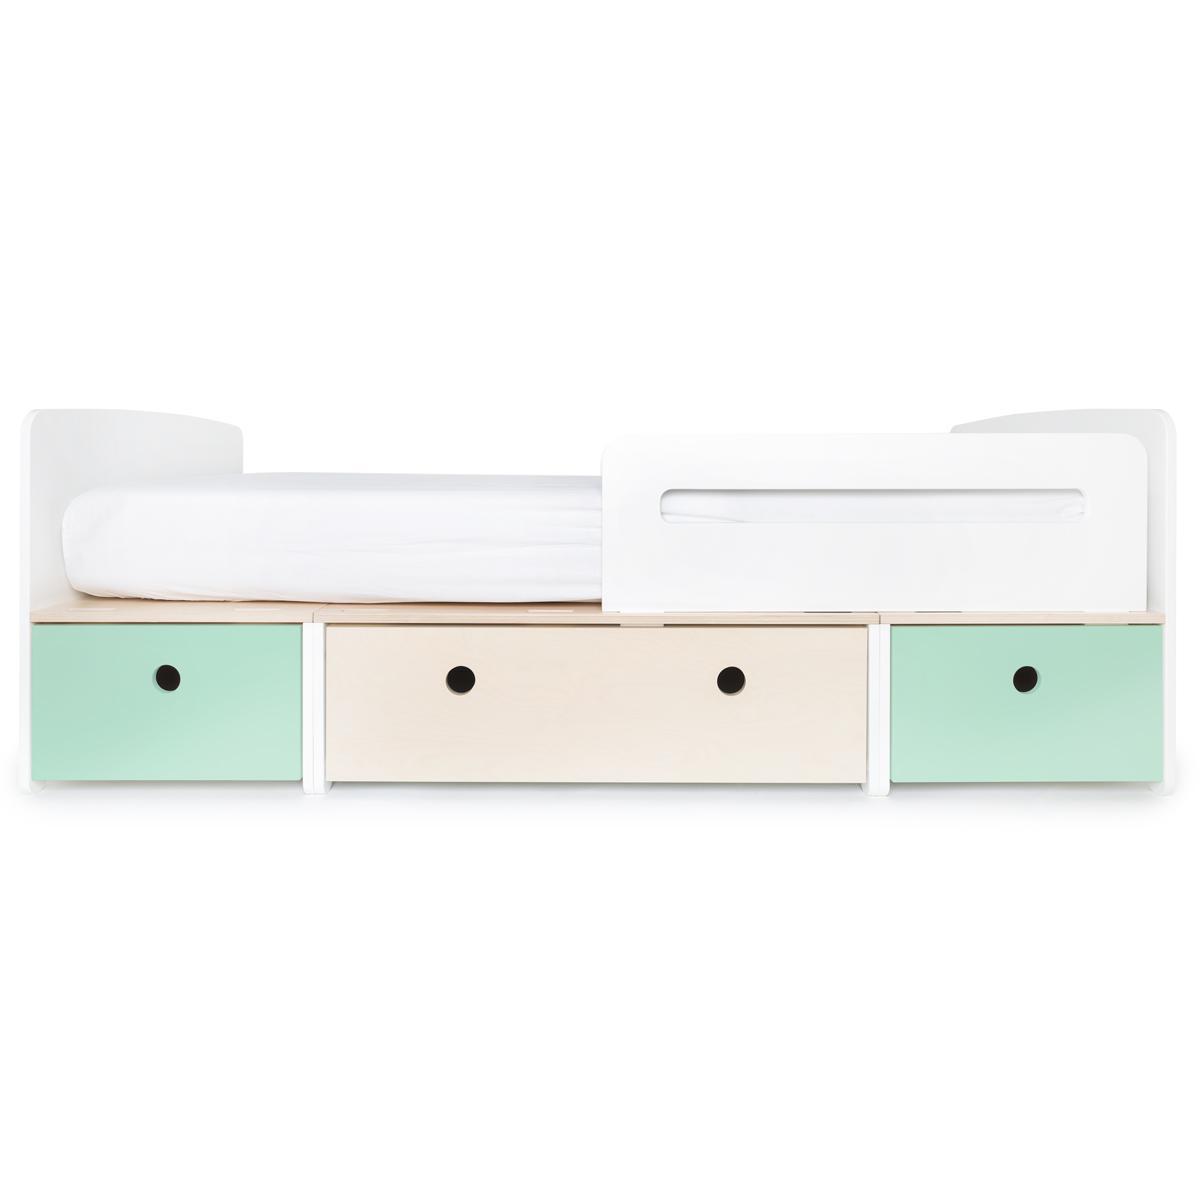 Kinderbett 90x200cm COLORFLEX mint-white wash-mint